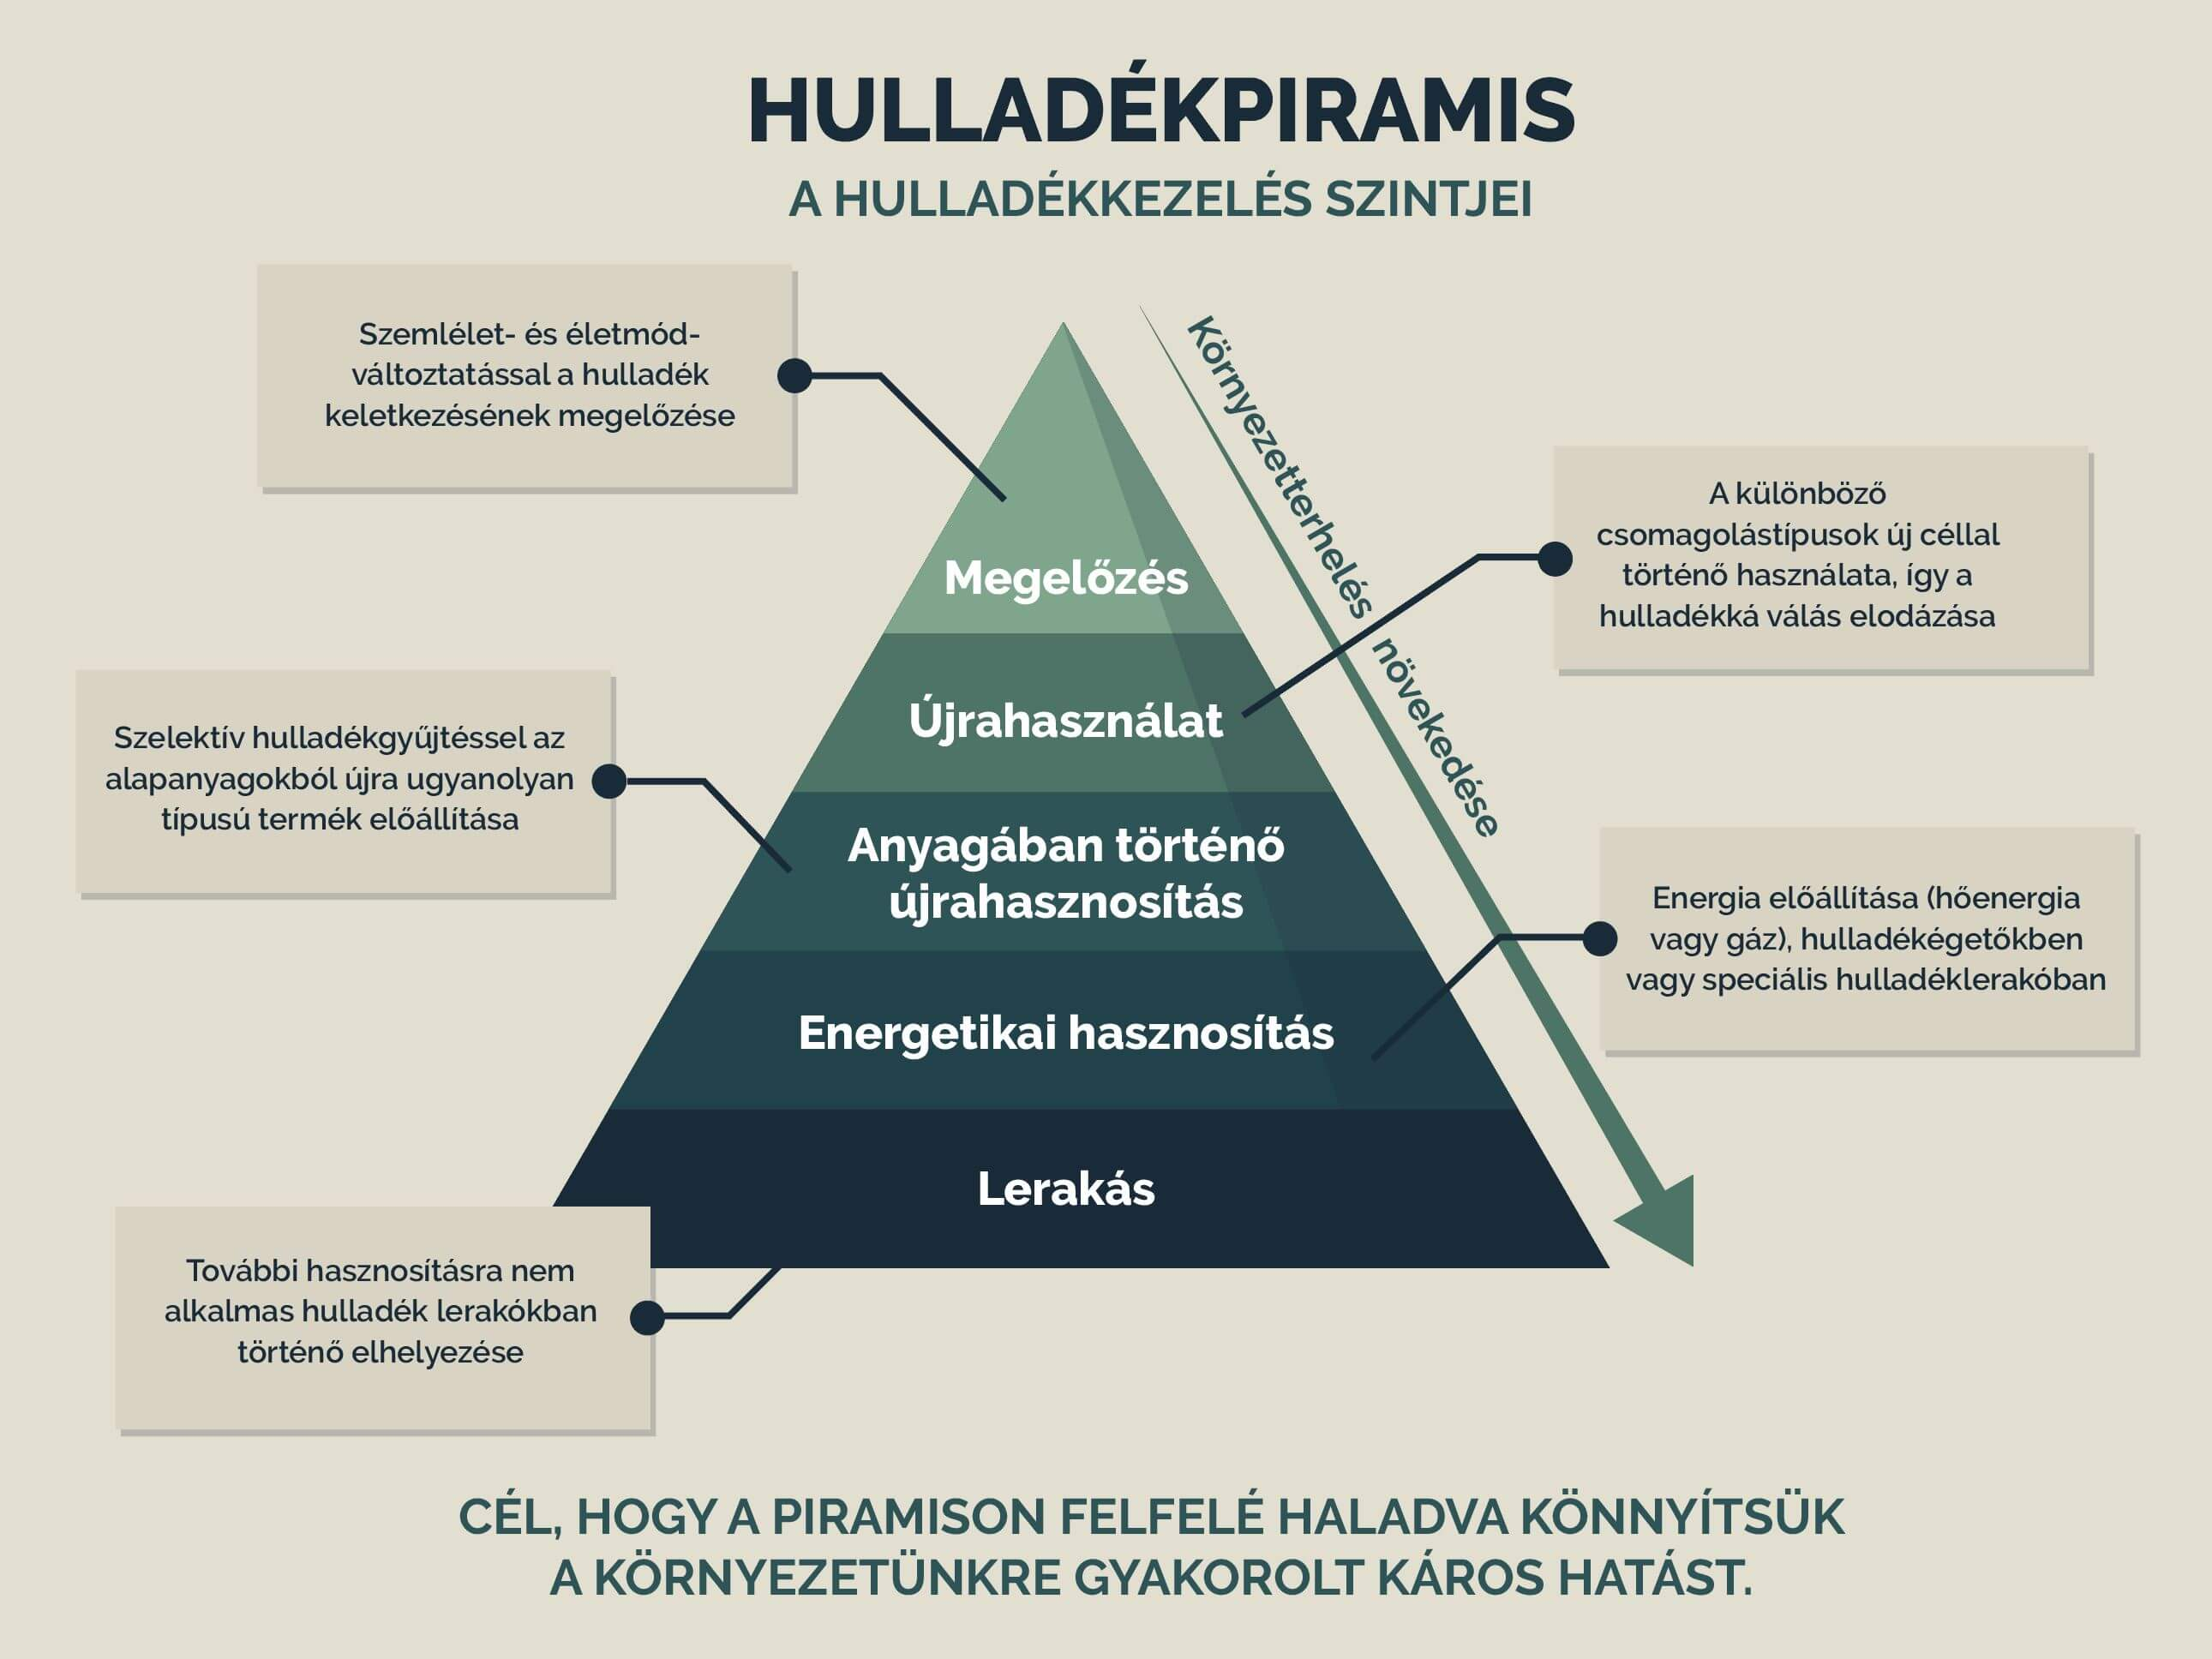 kkg_infografika_hulladekpiramis-1.jpg